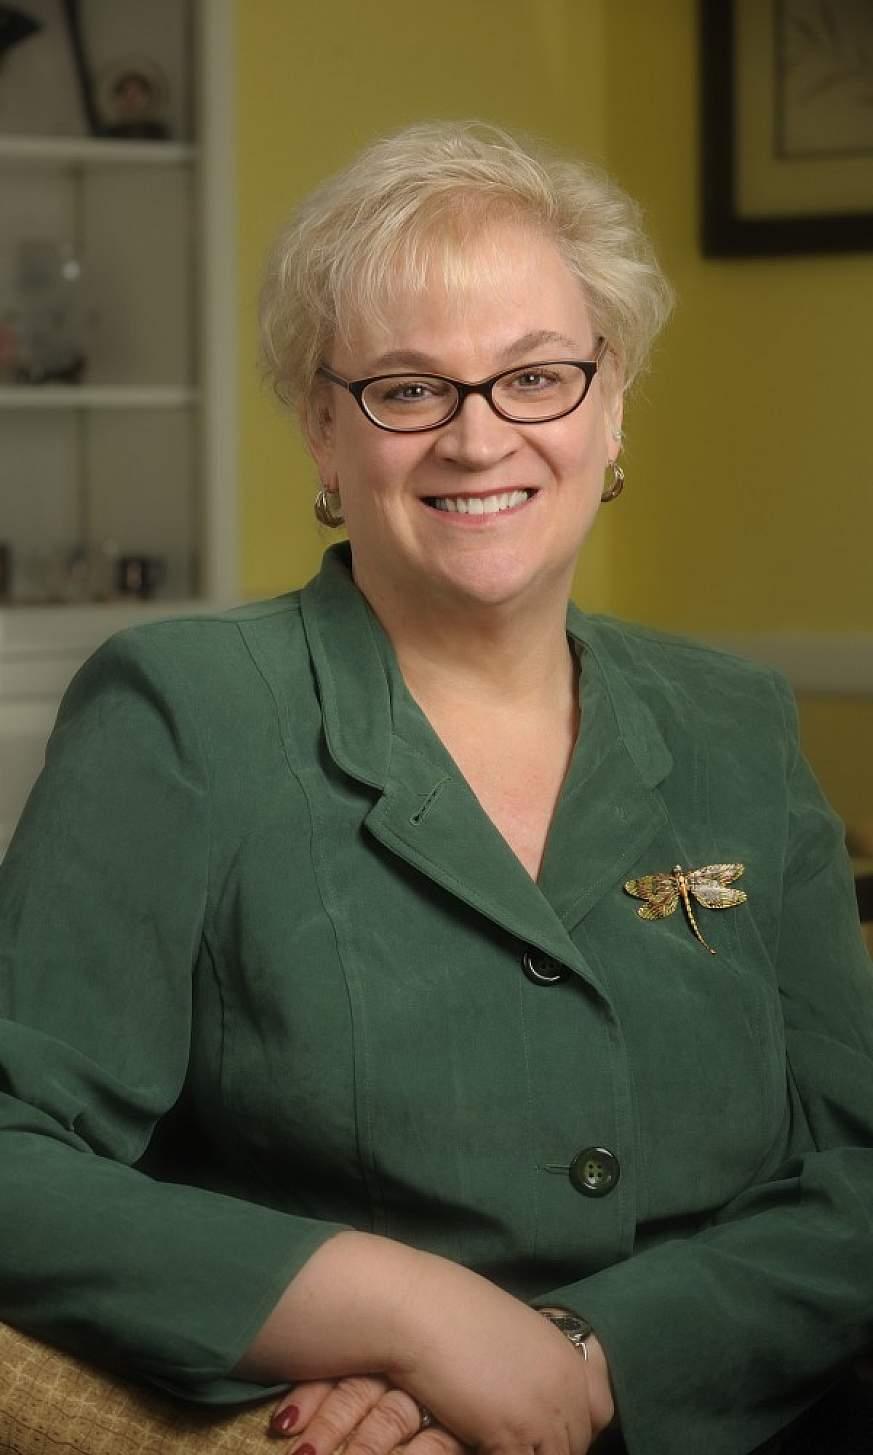 Dr. Sally Rockey